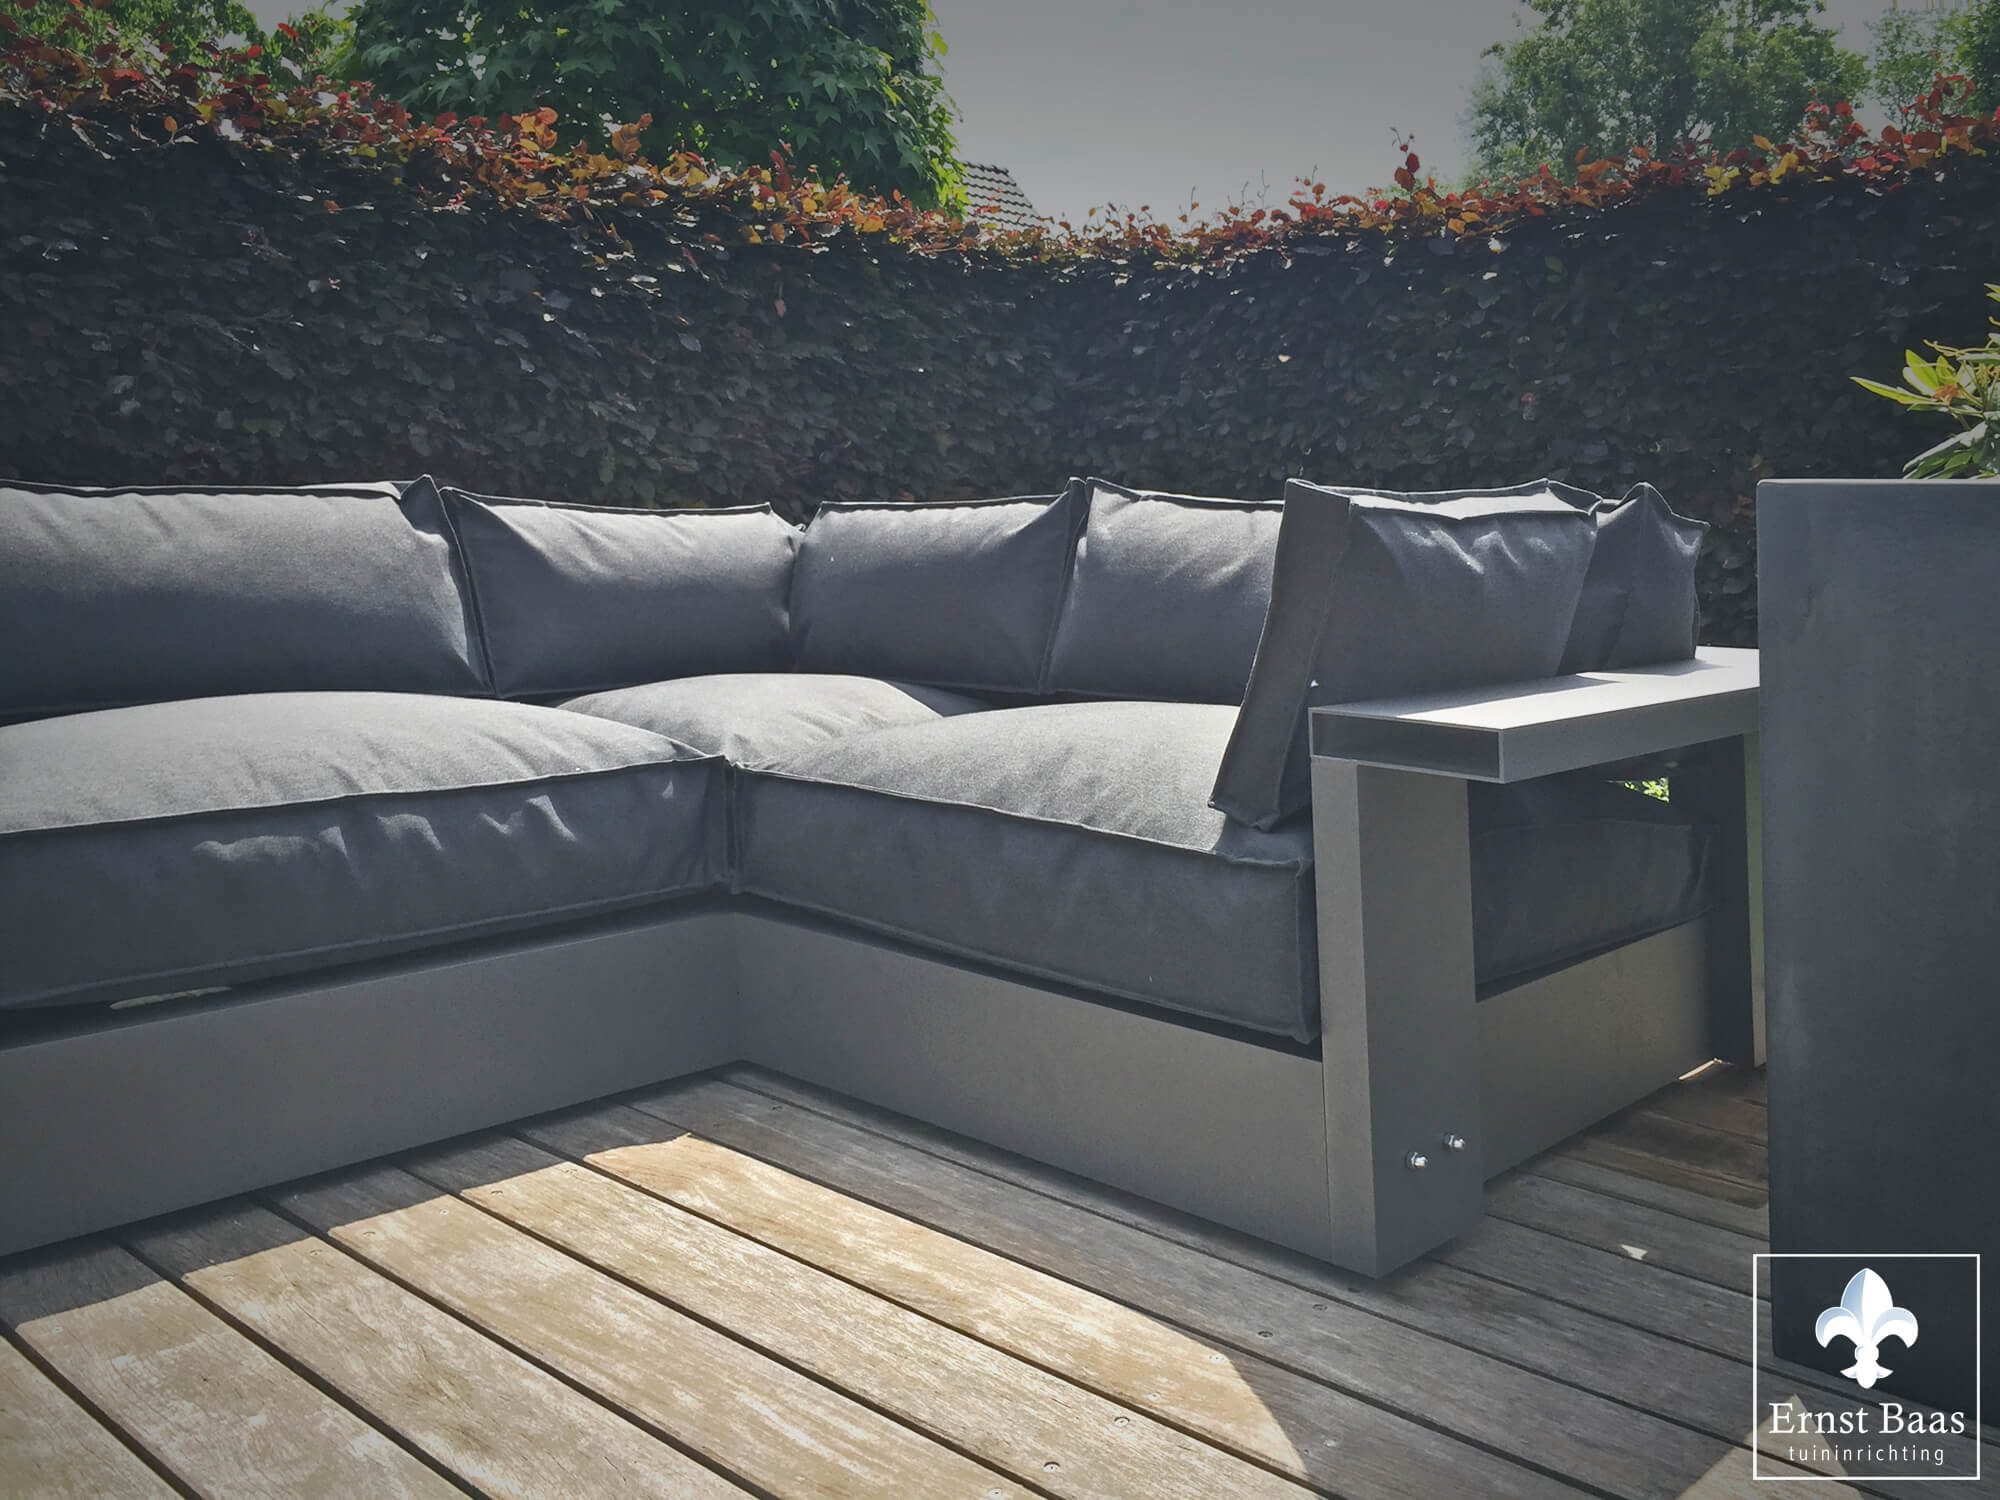 Lounge Set Tuin : Design loungesets ernst baas tuininrichting design tuinmeubelen